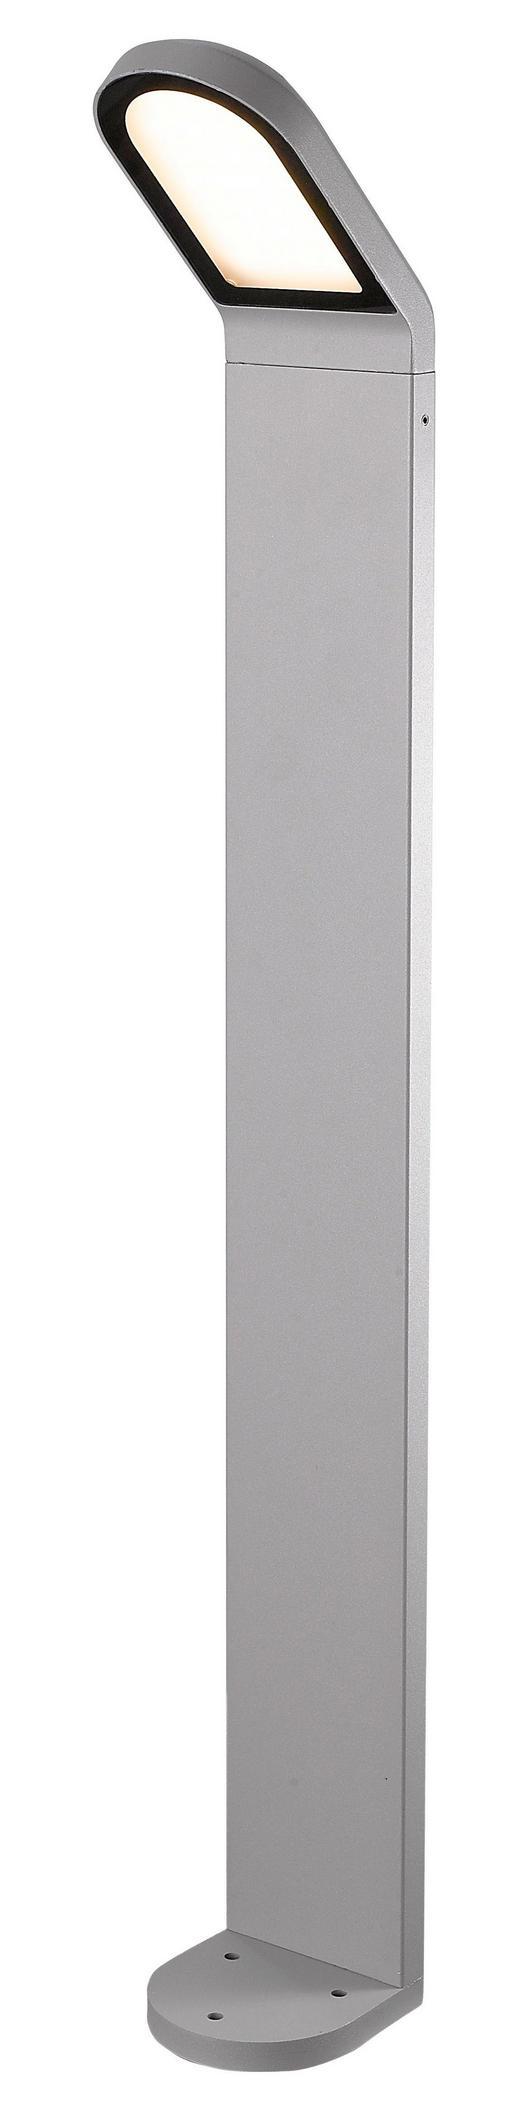 WEGELEUCHTE - Grau, Design, Metall (90/10,4/15,5cm)